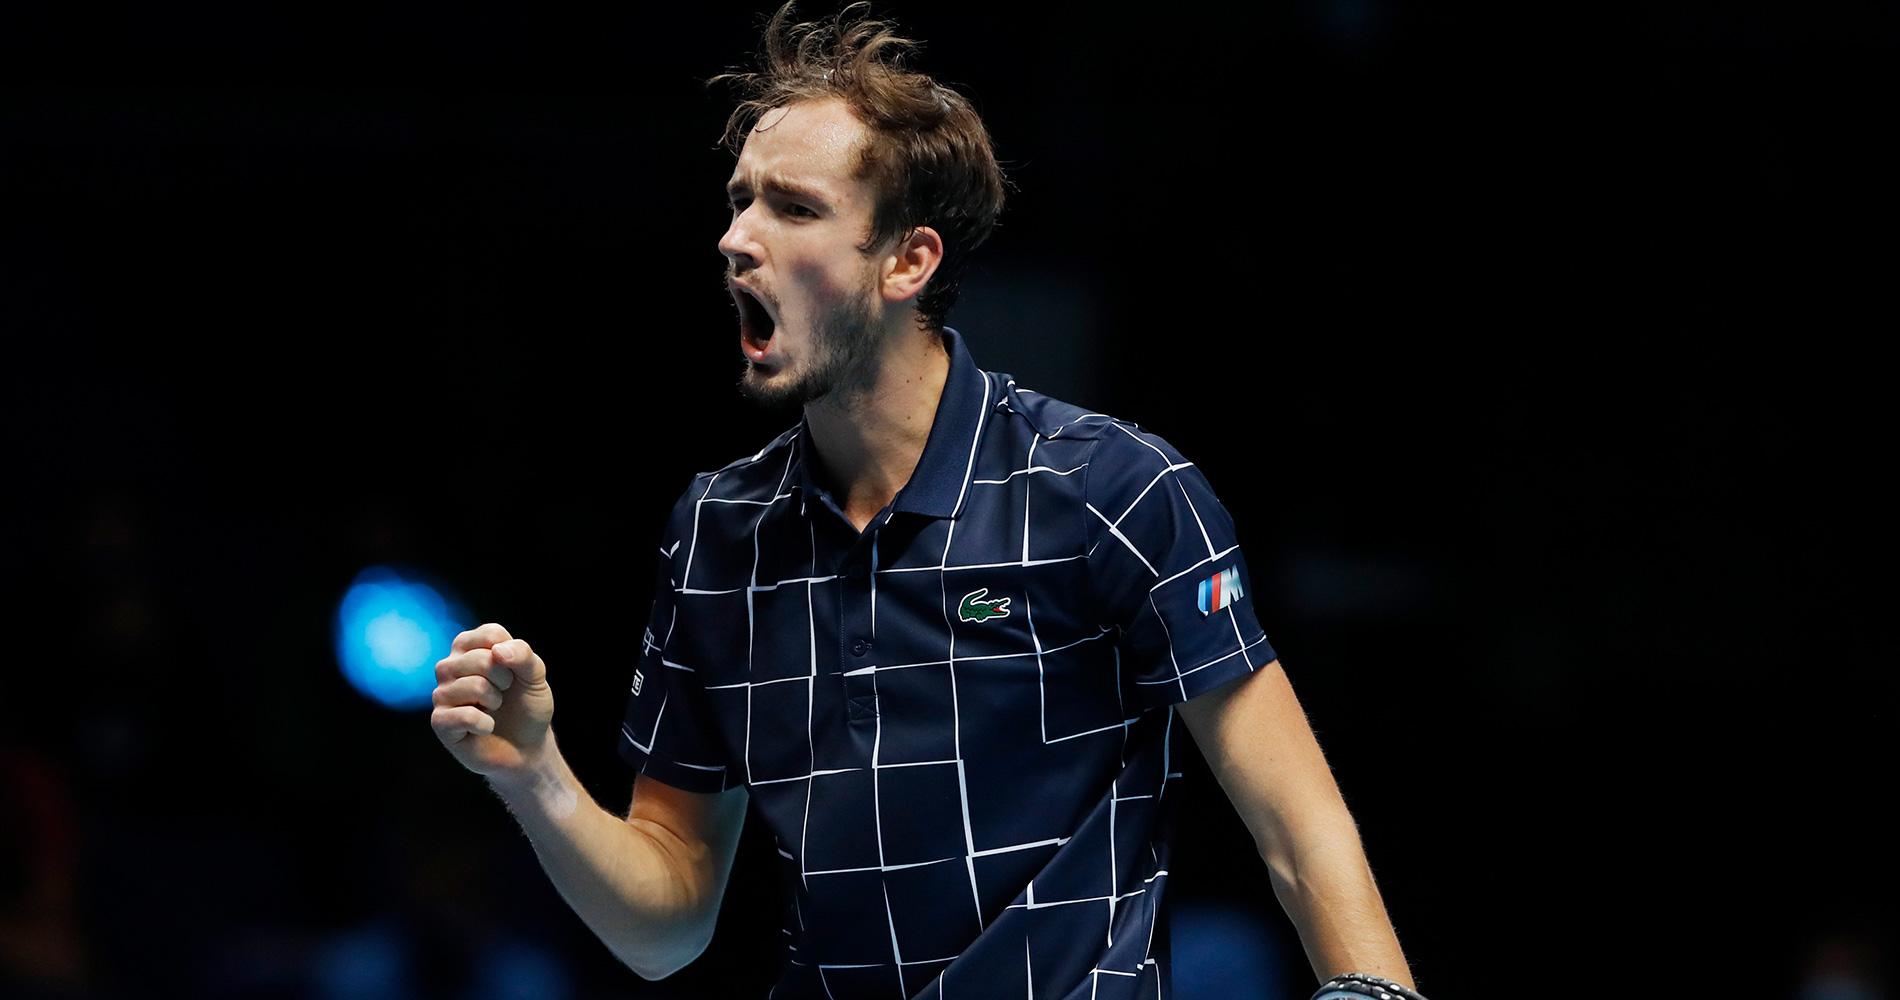 Medvedev ATP Finals Djokovic